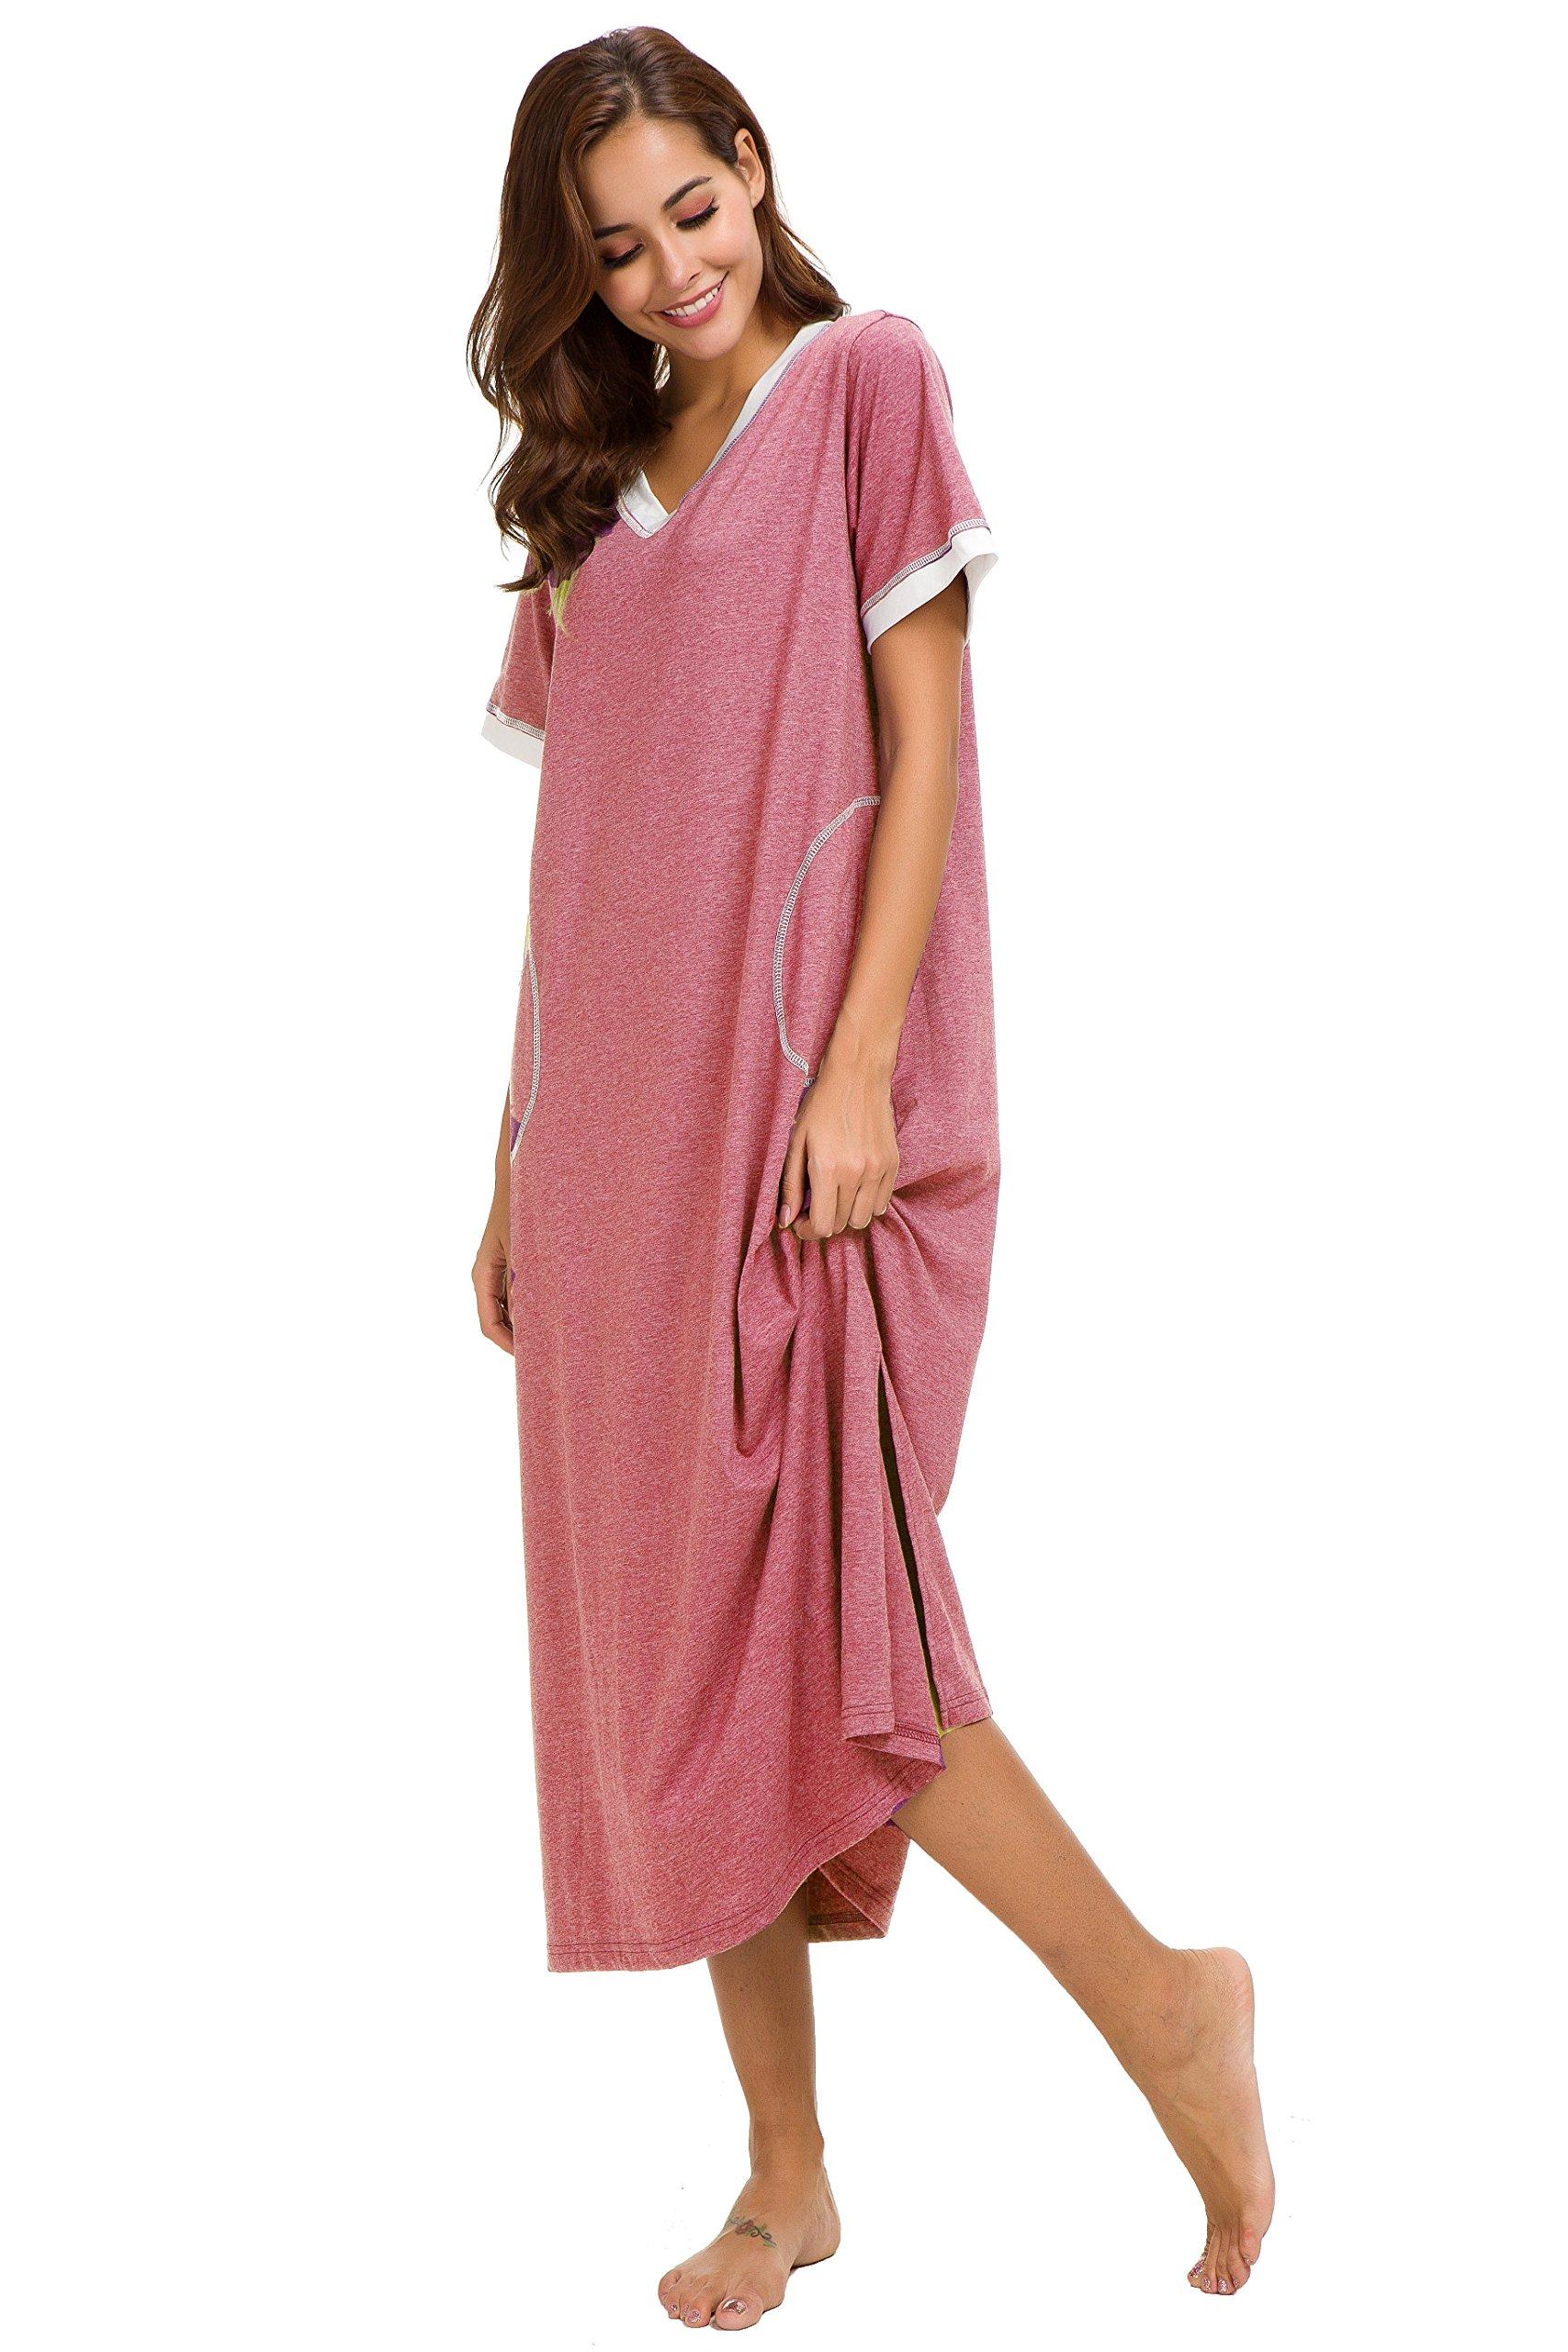 Aviier Supersoft Maxi Sleepshirt with Pockets, Nightgowns for Women Short Sleeve Cotton Nightshirts Sleepwear (XXL, Red) by Aviier (Image #2)